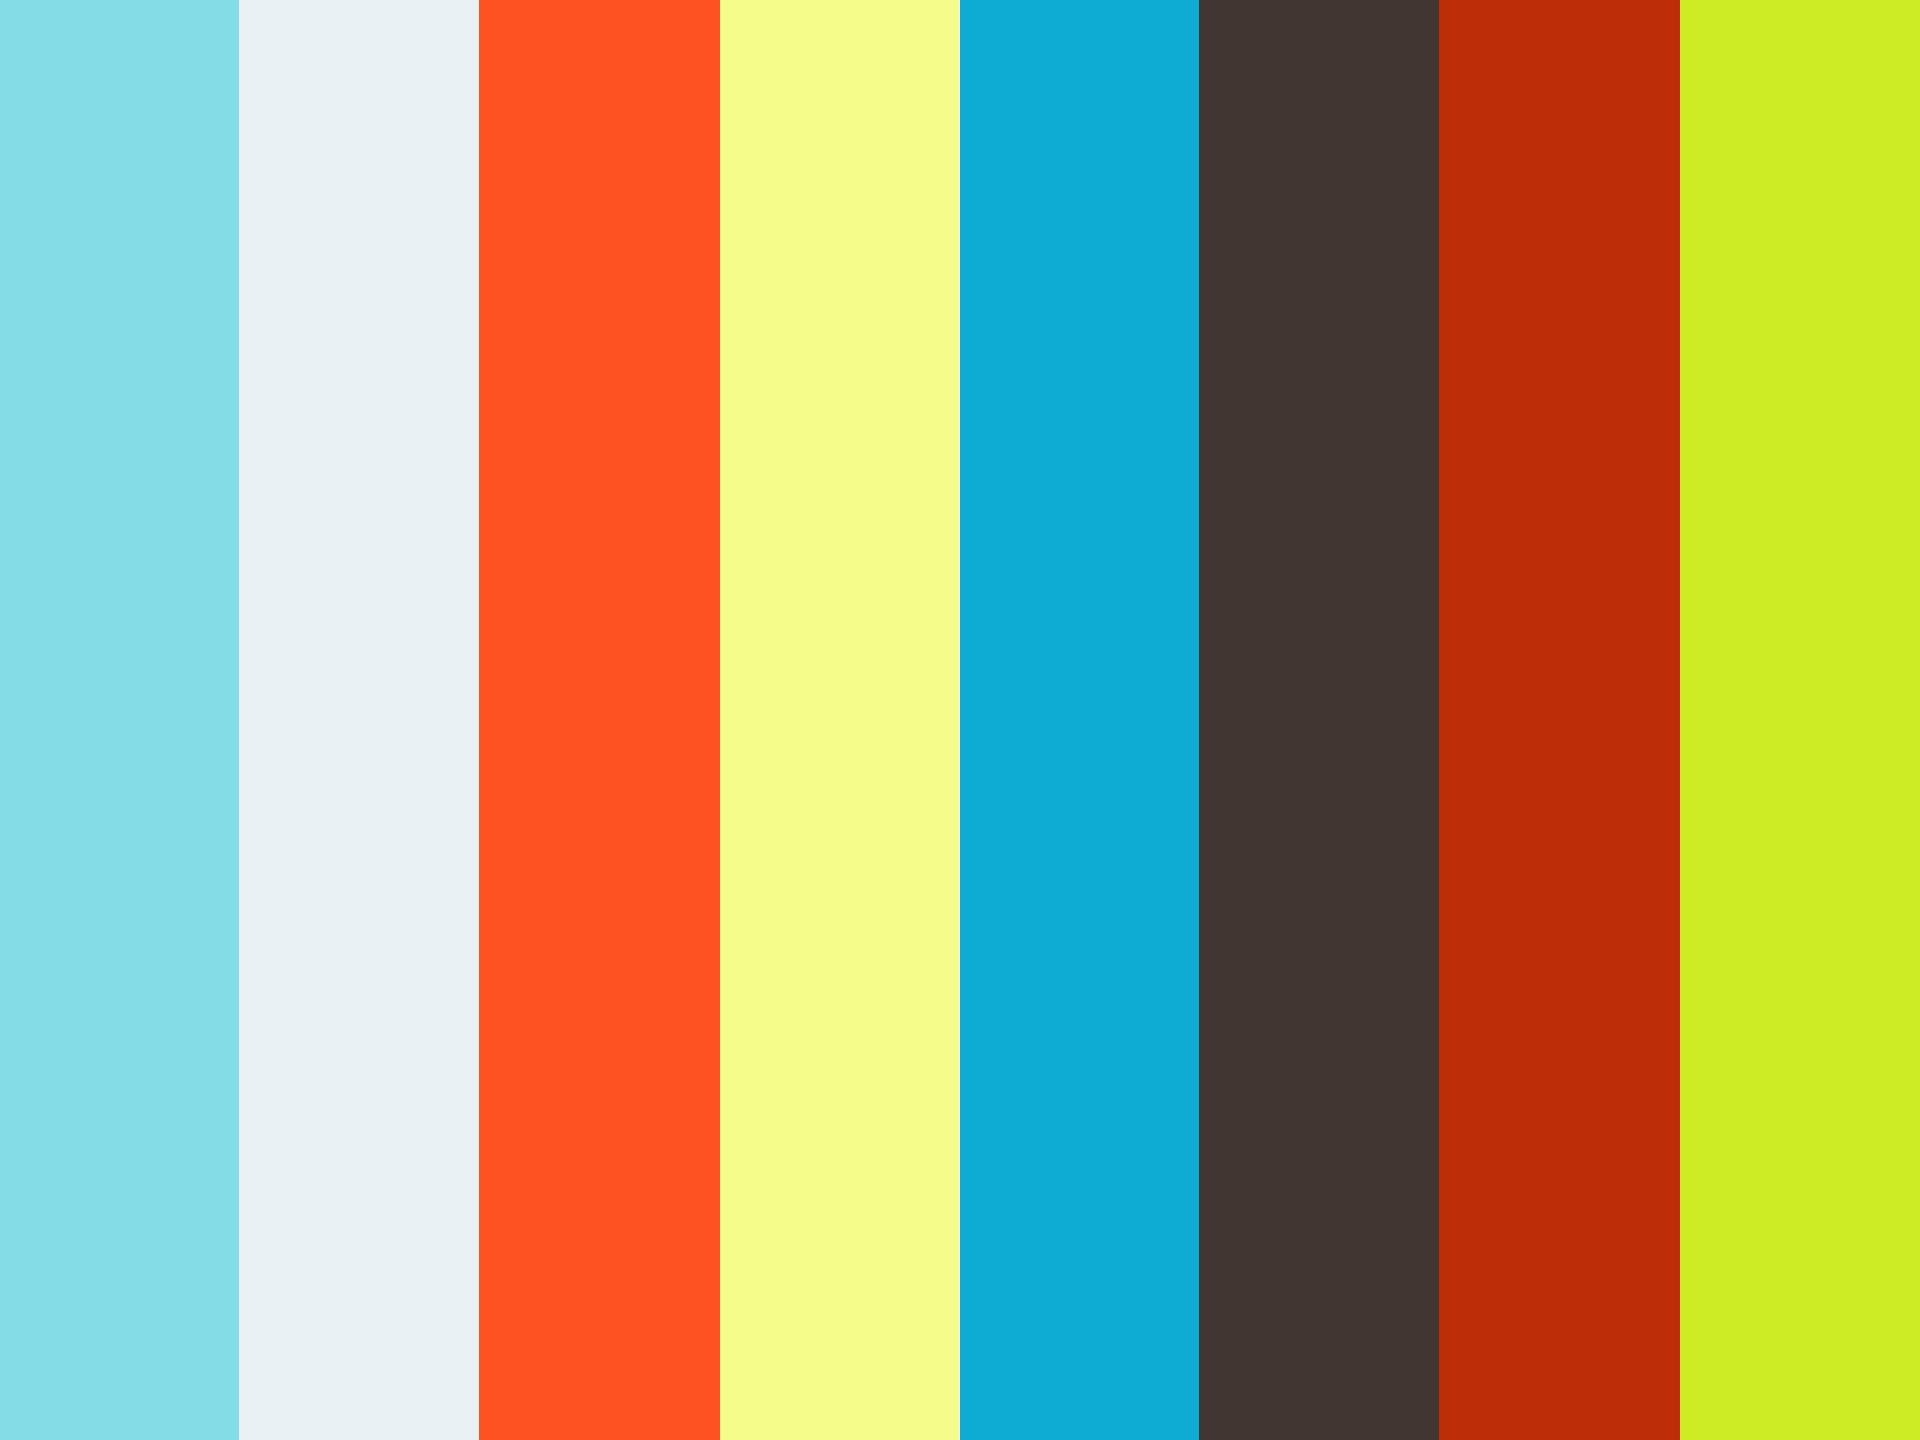 Film: Design Matters / Aleksi Puustinen & Aleksi Vesaluoma